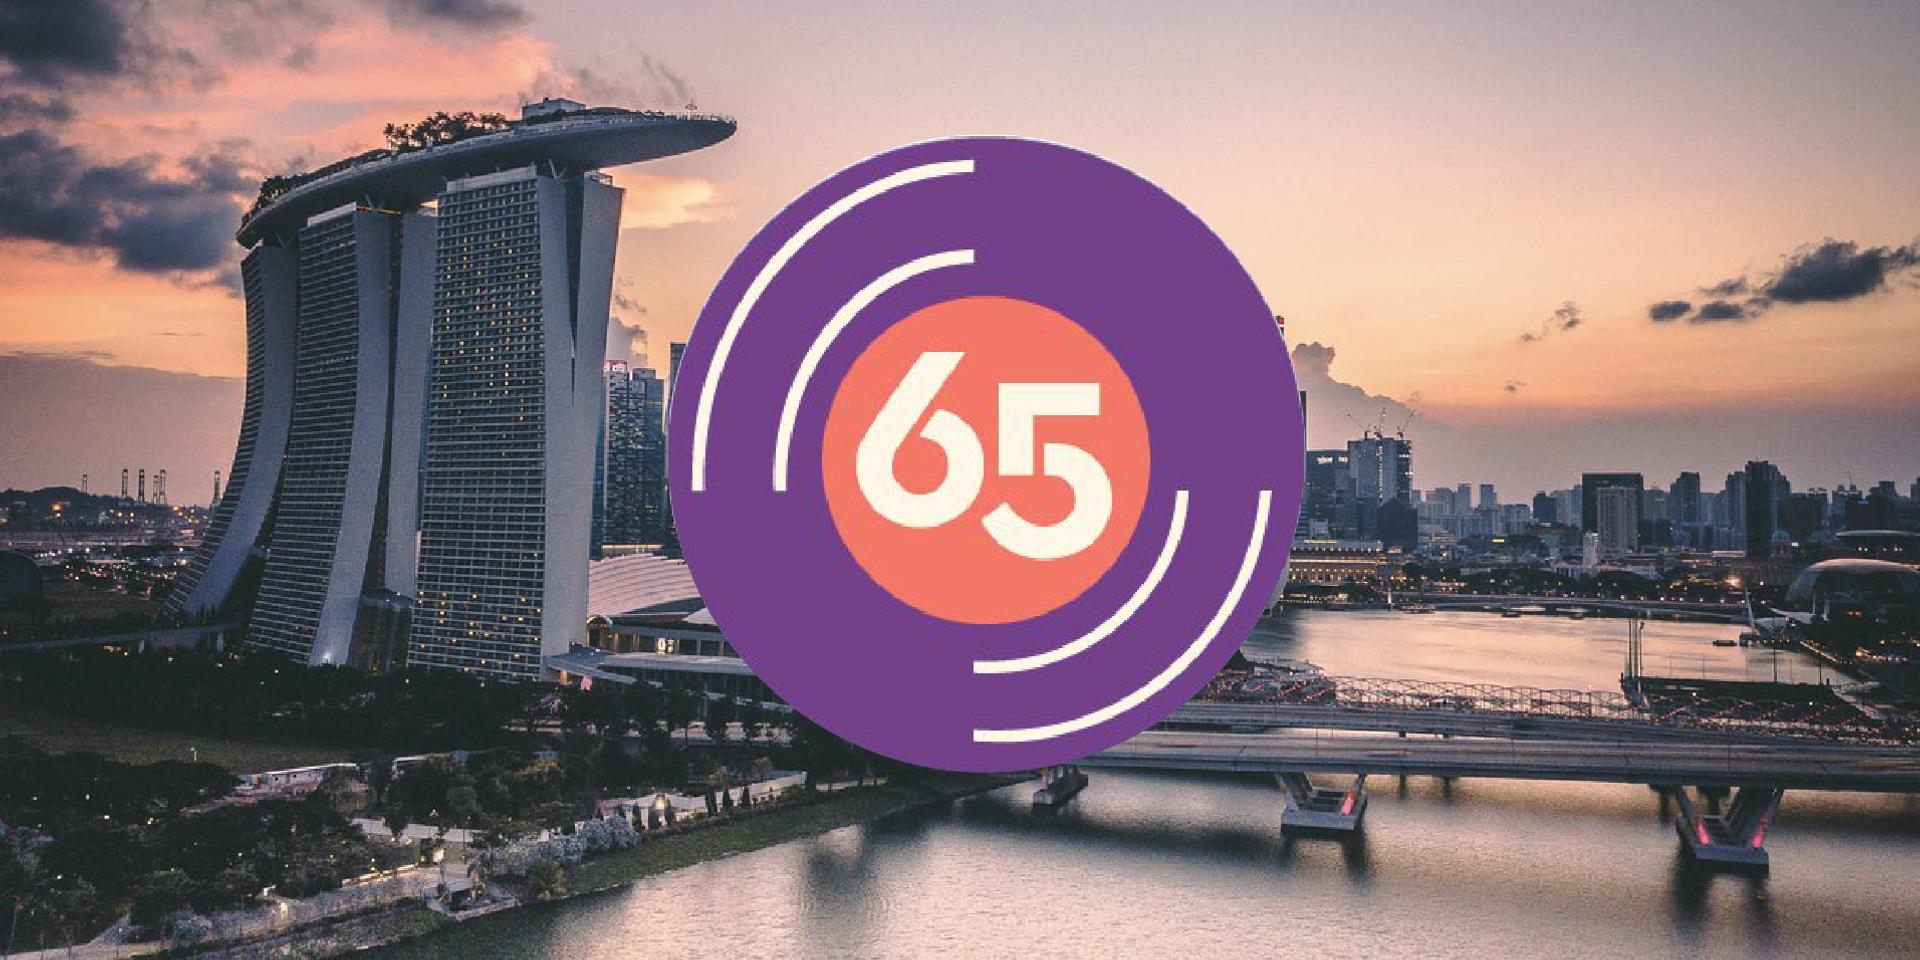 Introducing the Singapore music emoji on Twitter